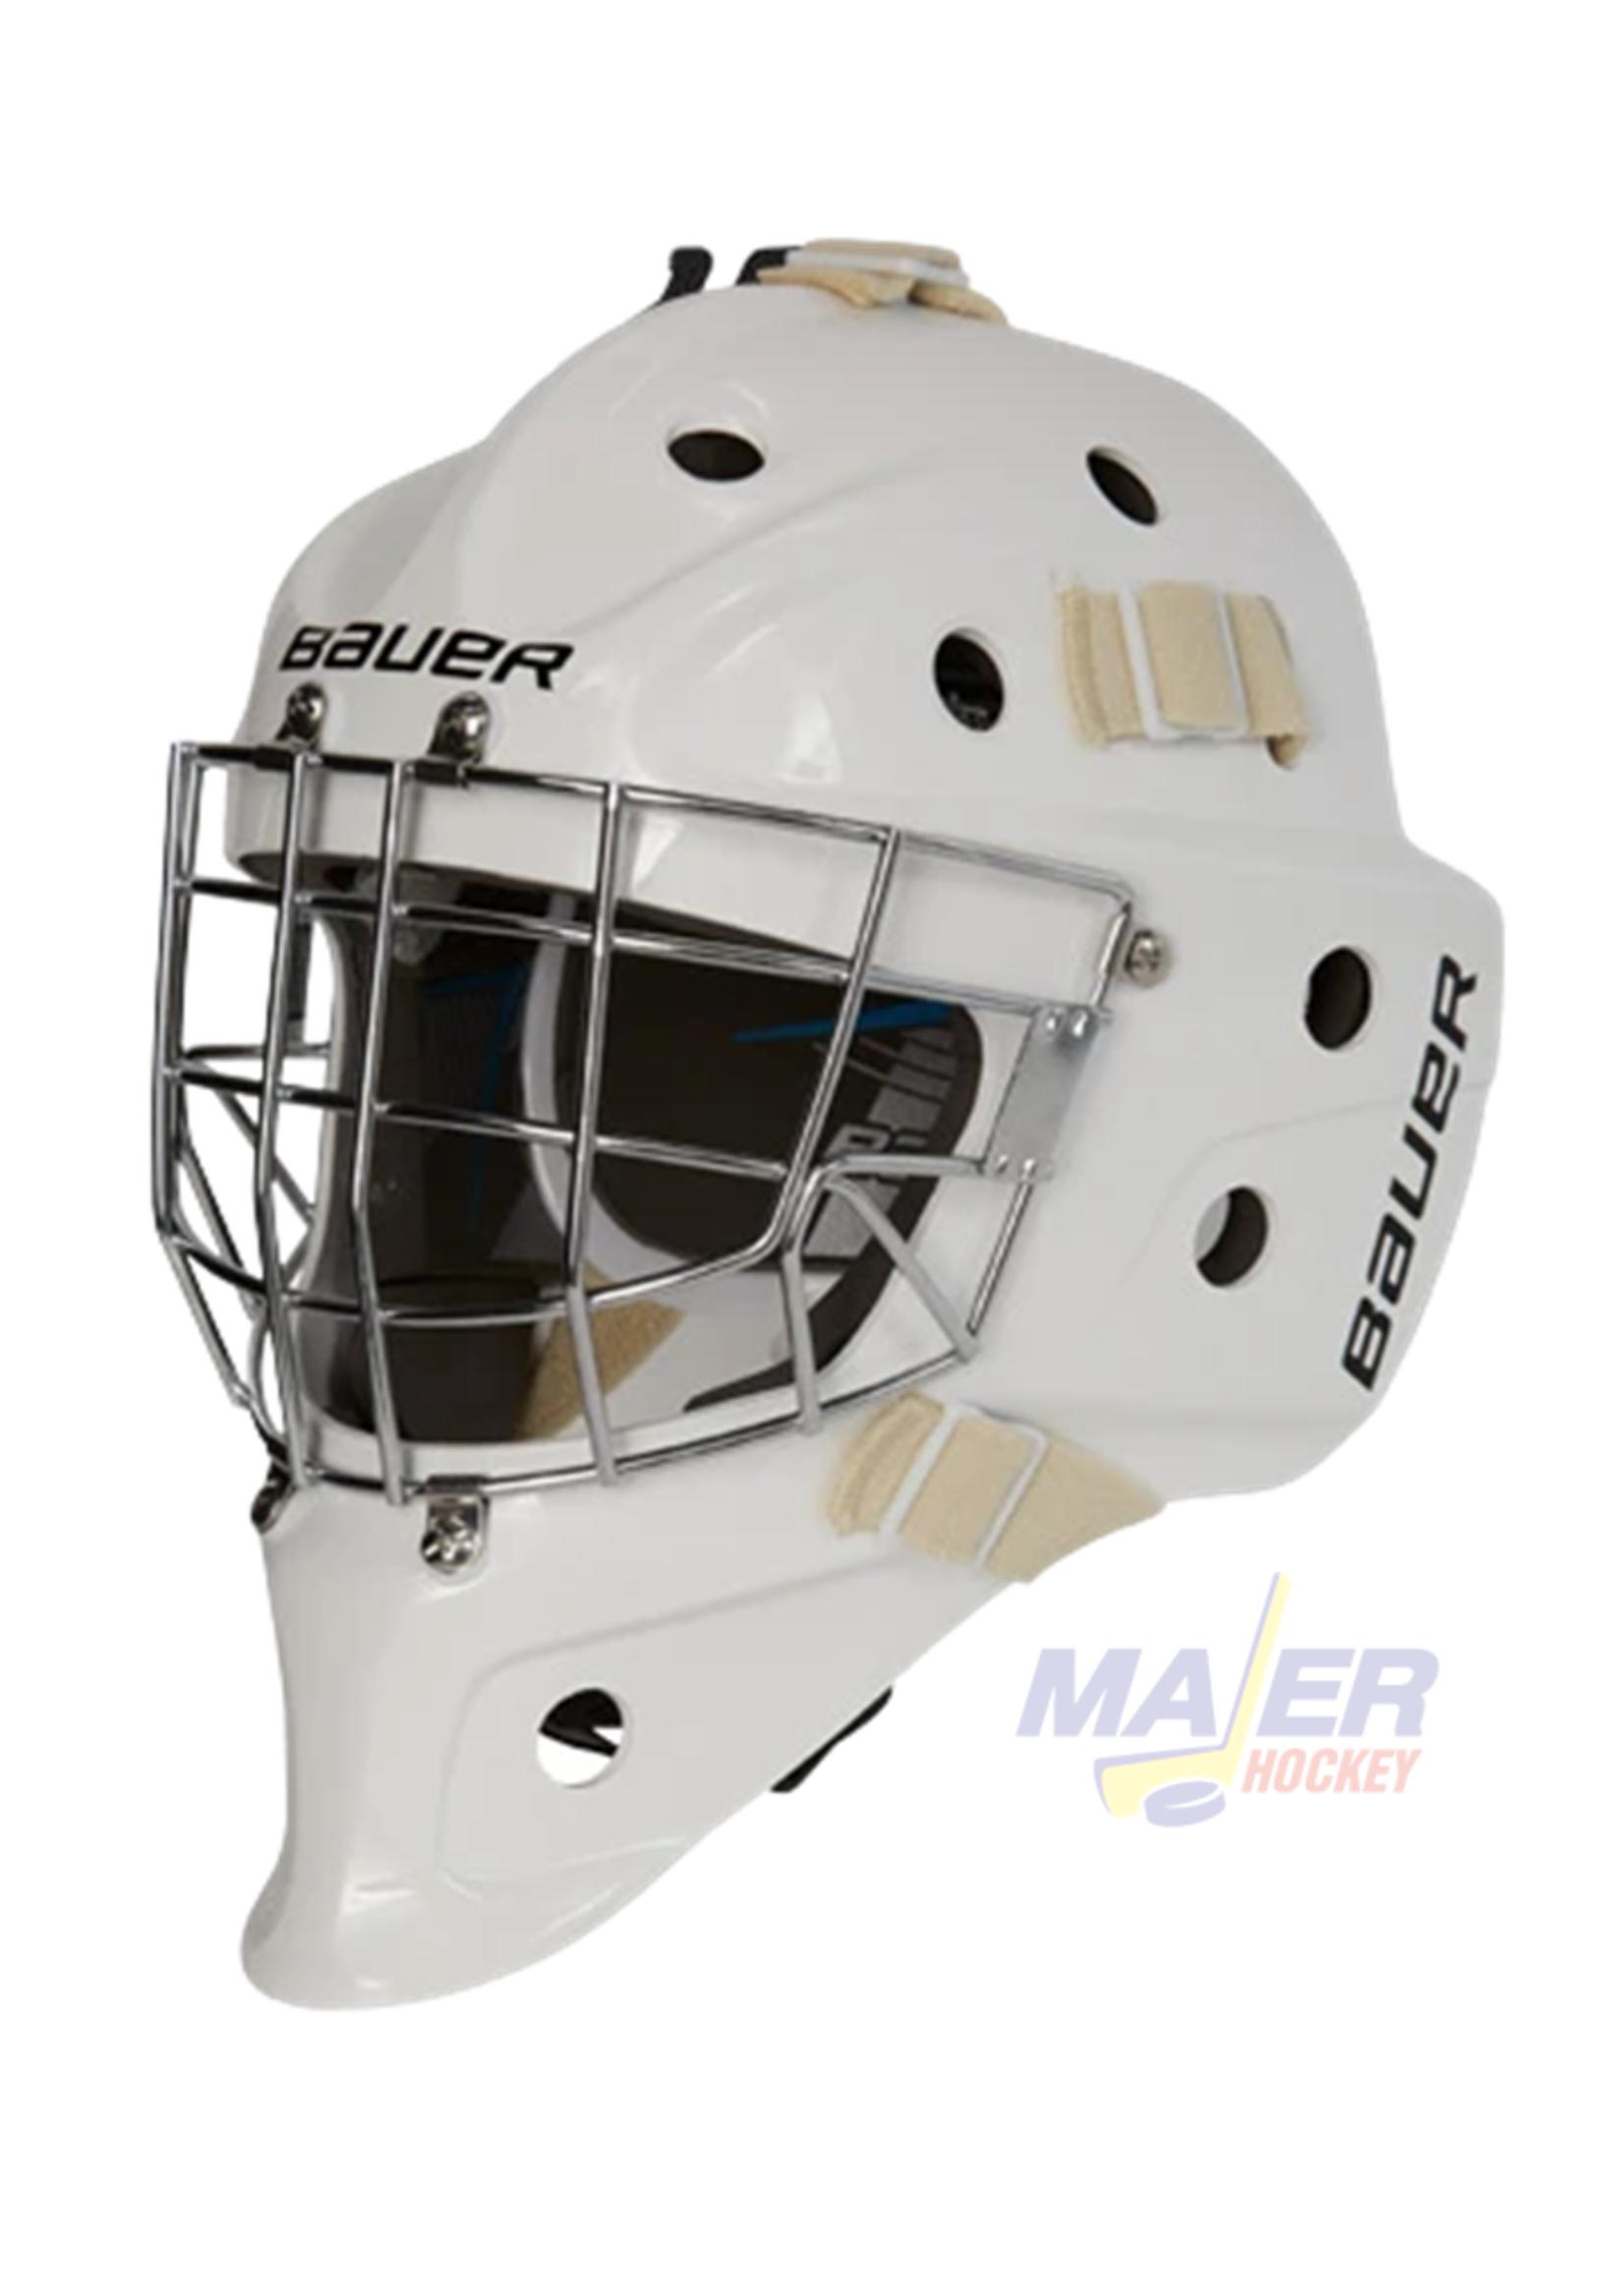 Bauer 930 Junior Goalie Mask